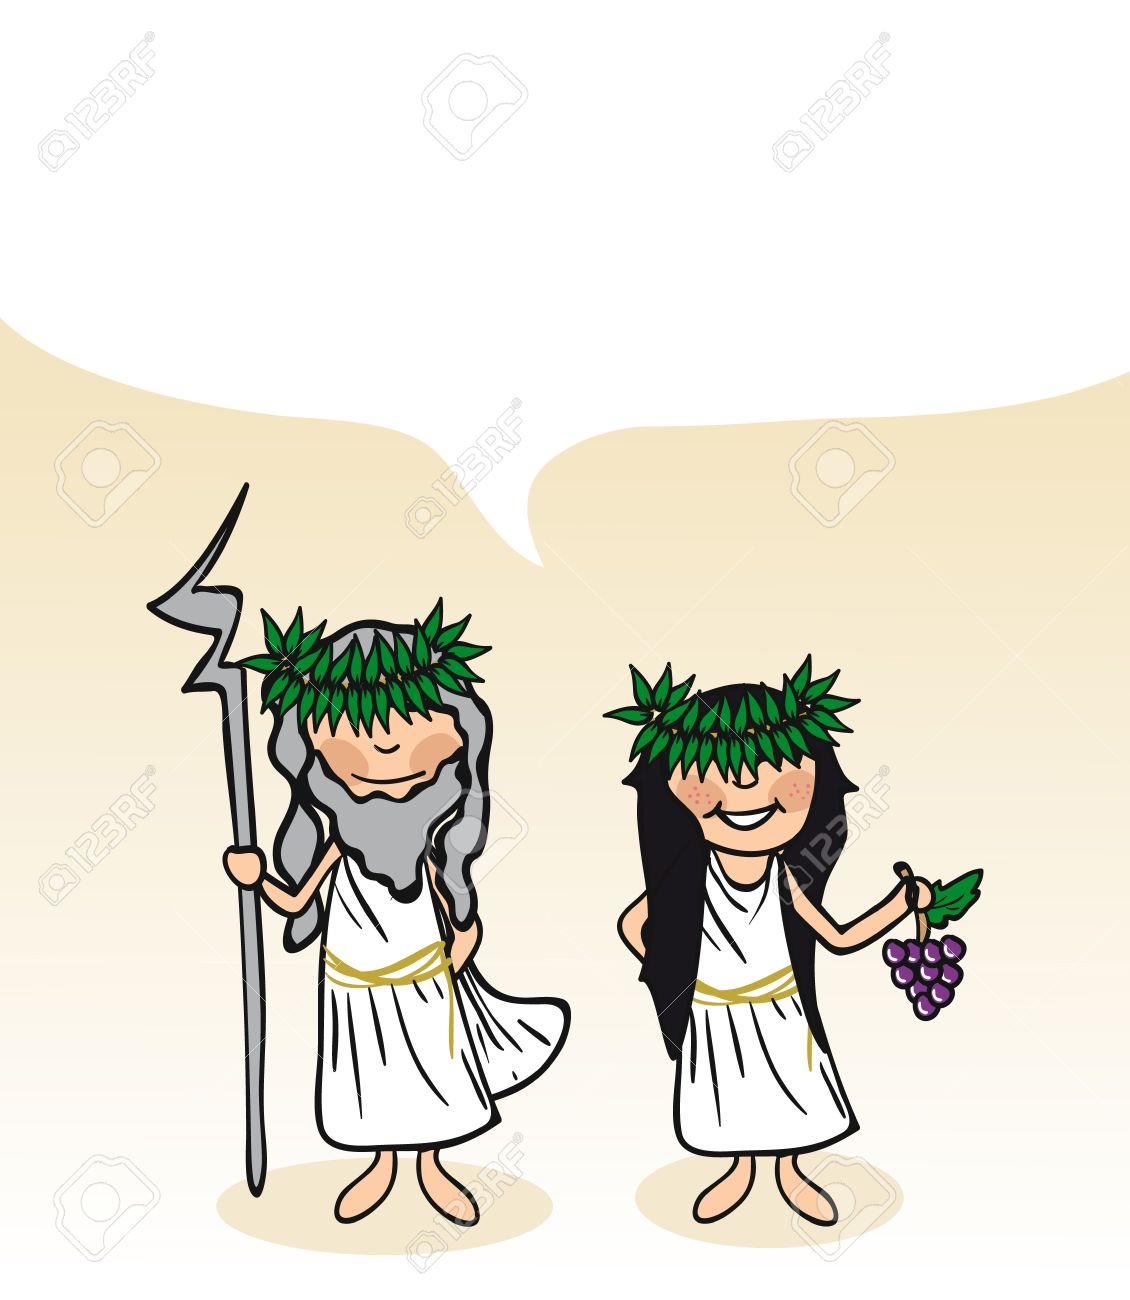 Greek man and woman cartoon couple with social media bubble. Stock Vector - 21280305